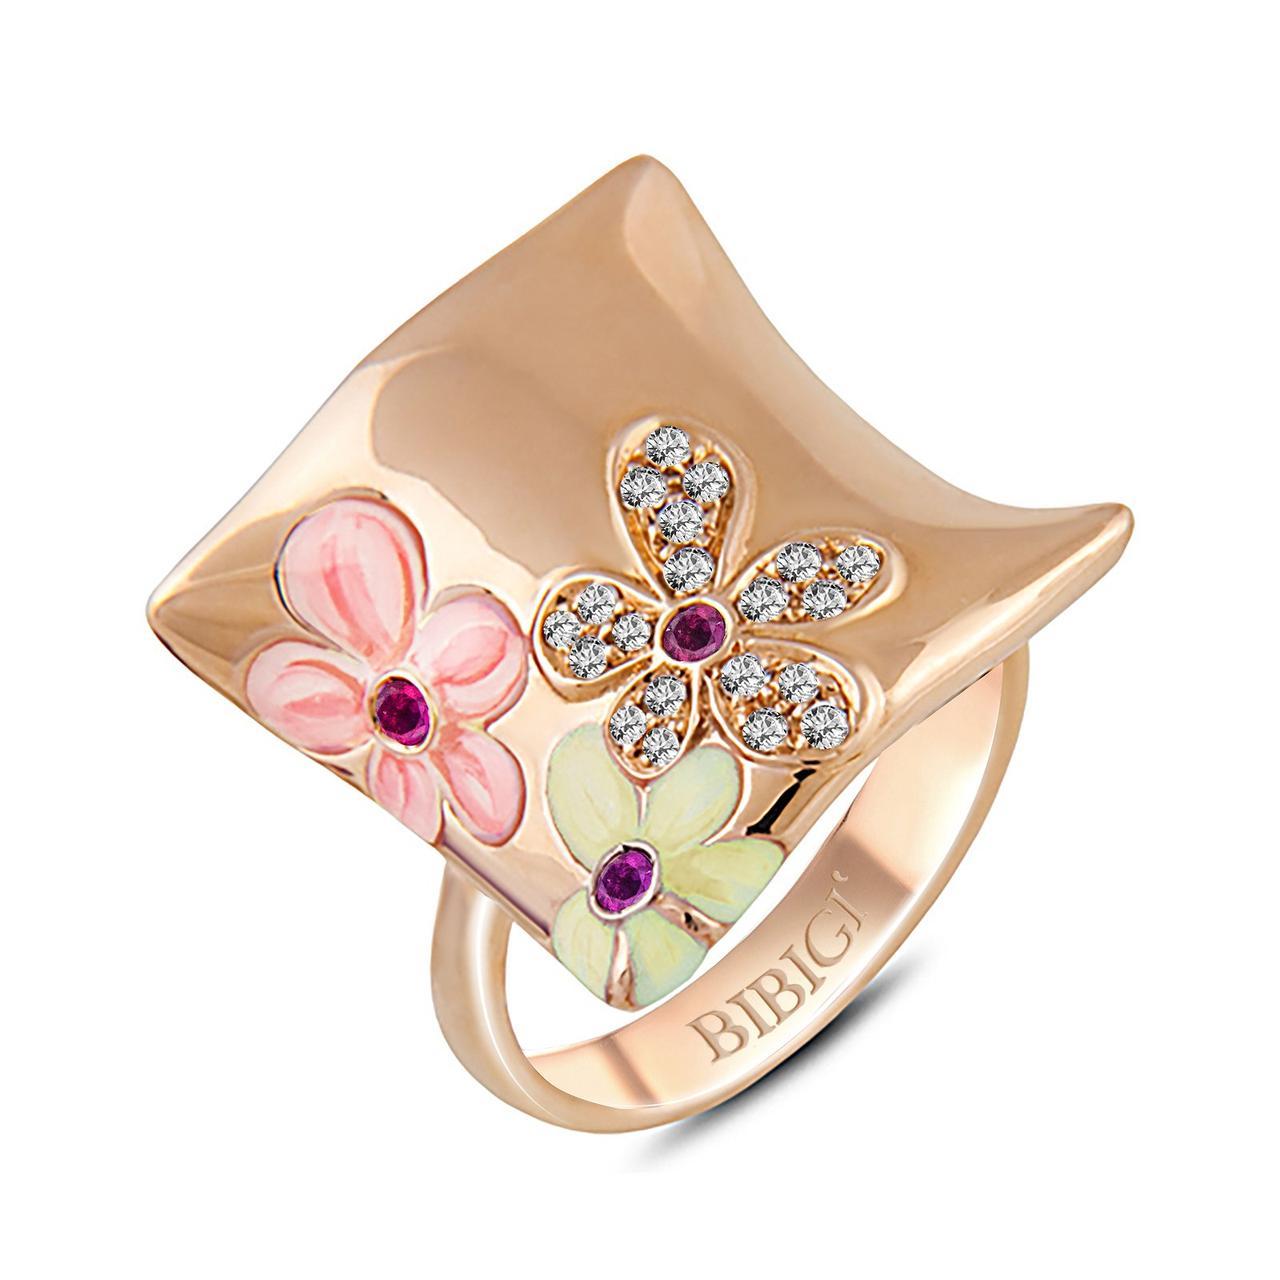 Золотое кольцо с бриллиантами и сапфирами, размер 17.5 (002116)